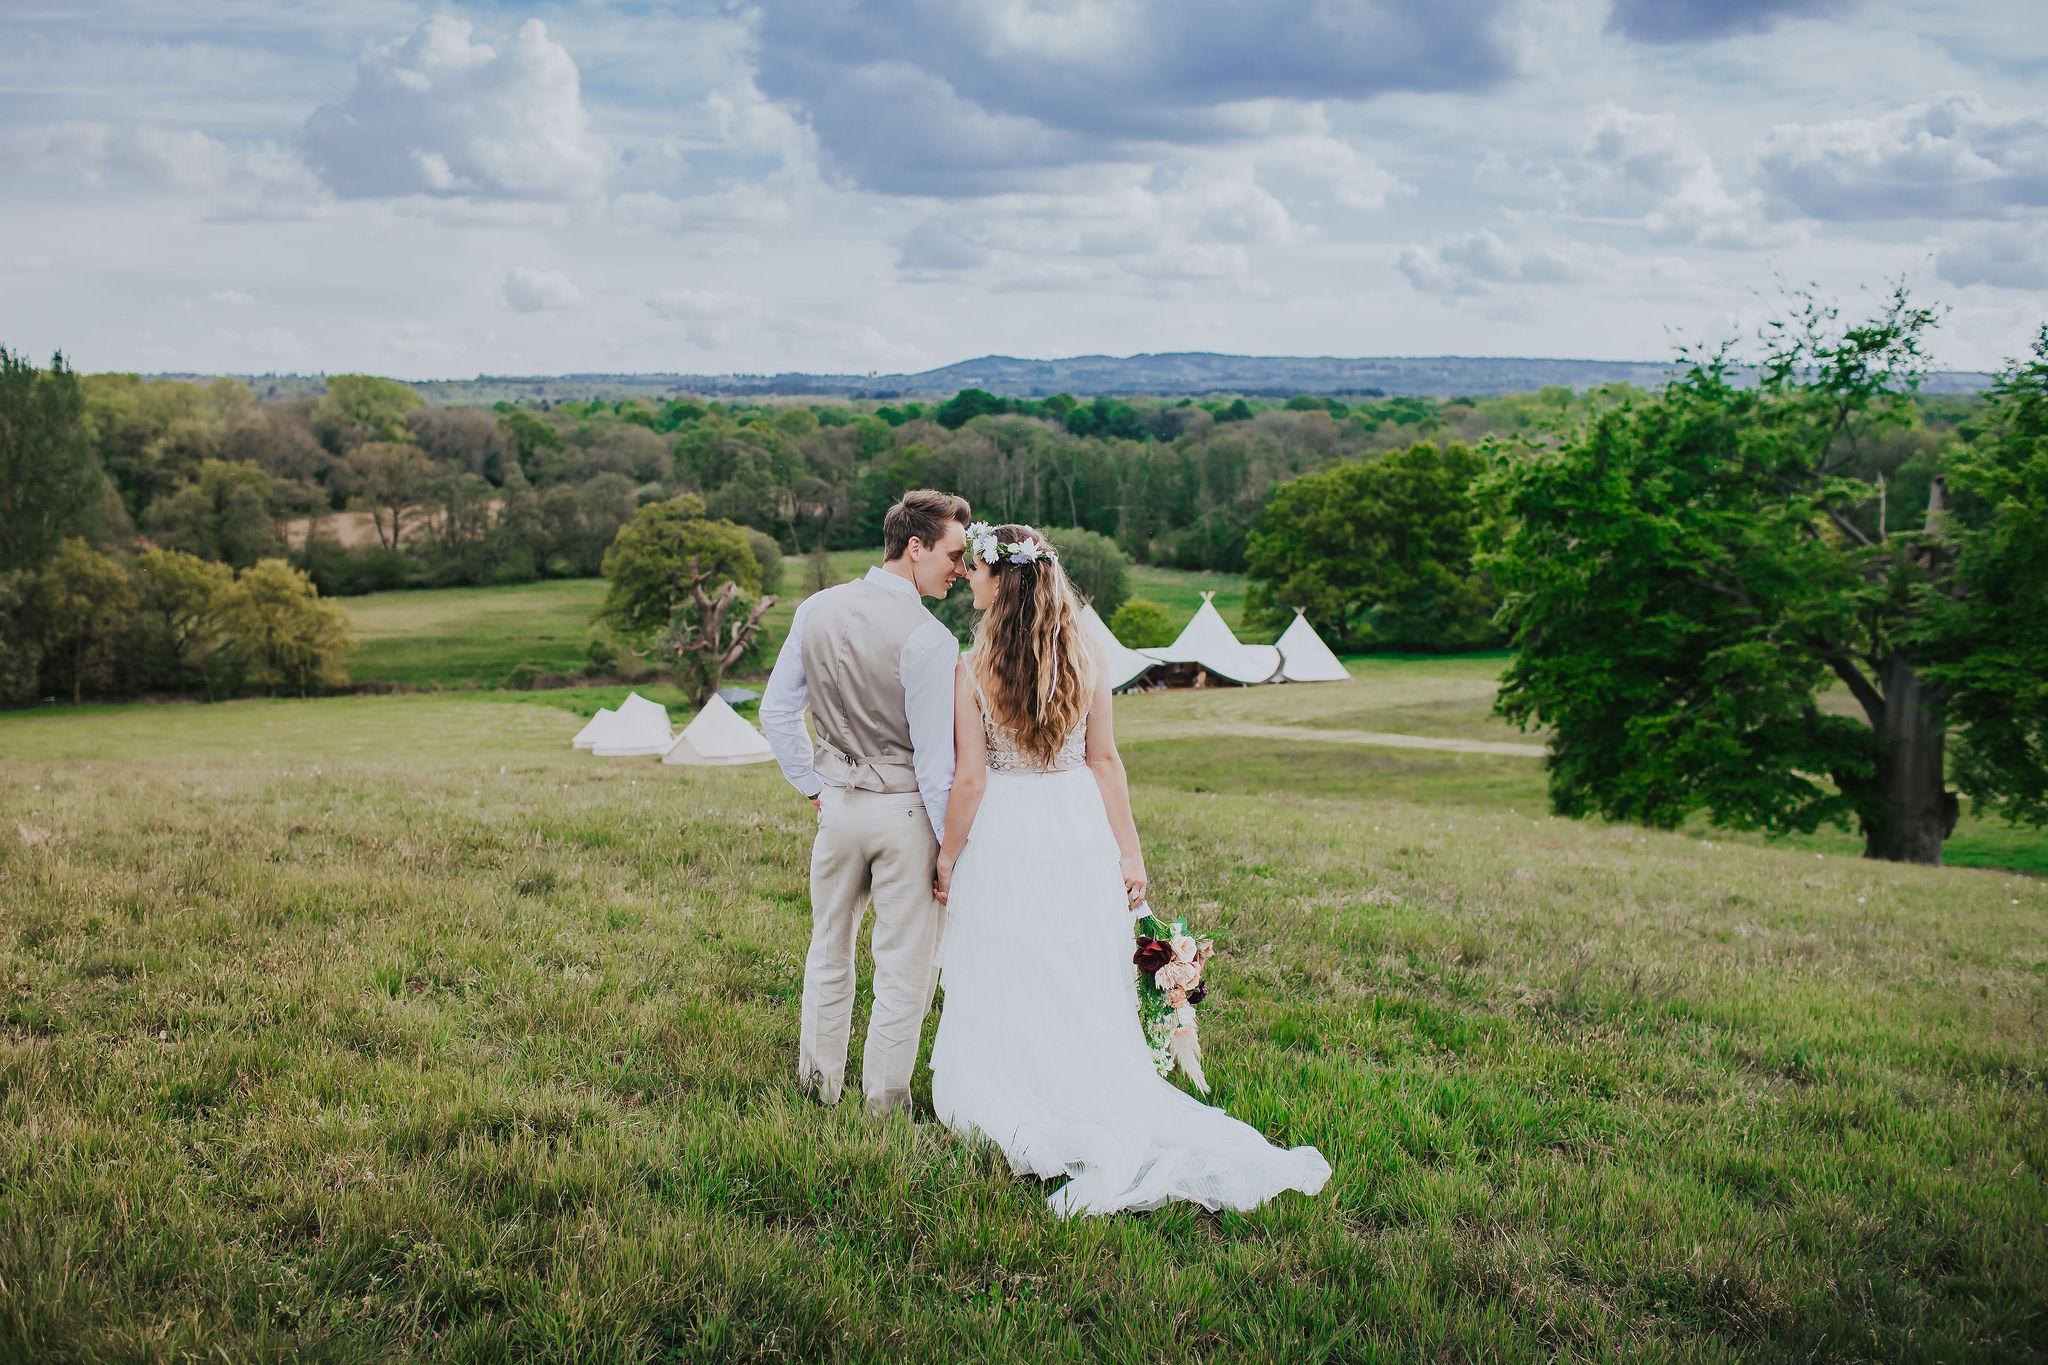 canvas-and-light-tipis-wedding-venue-surrey.jpg